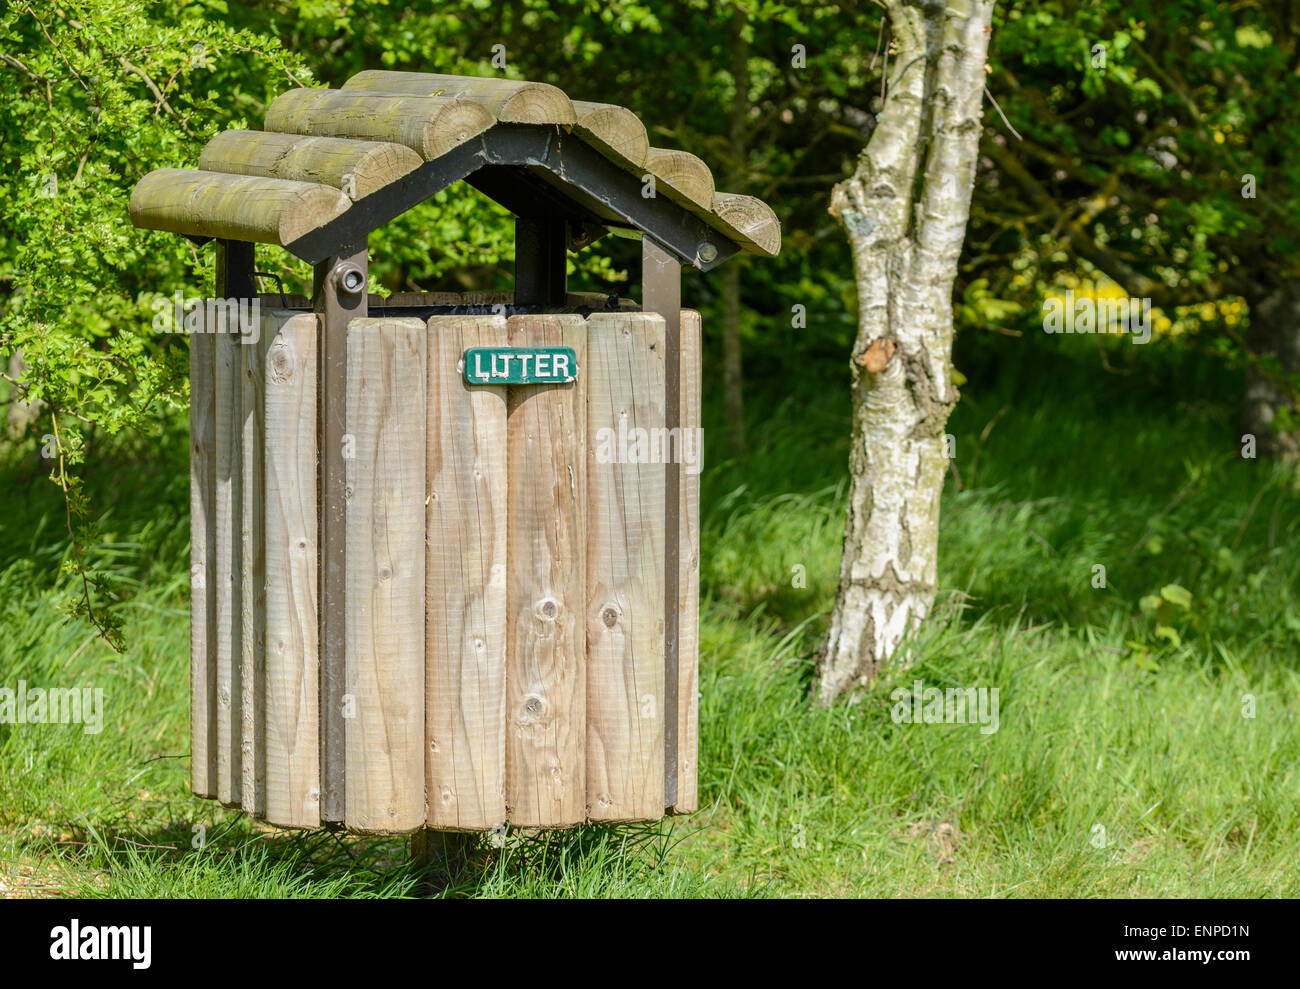 Wooden litter bin in a park. - Stock Image